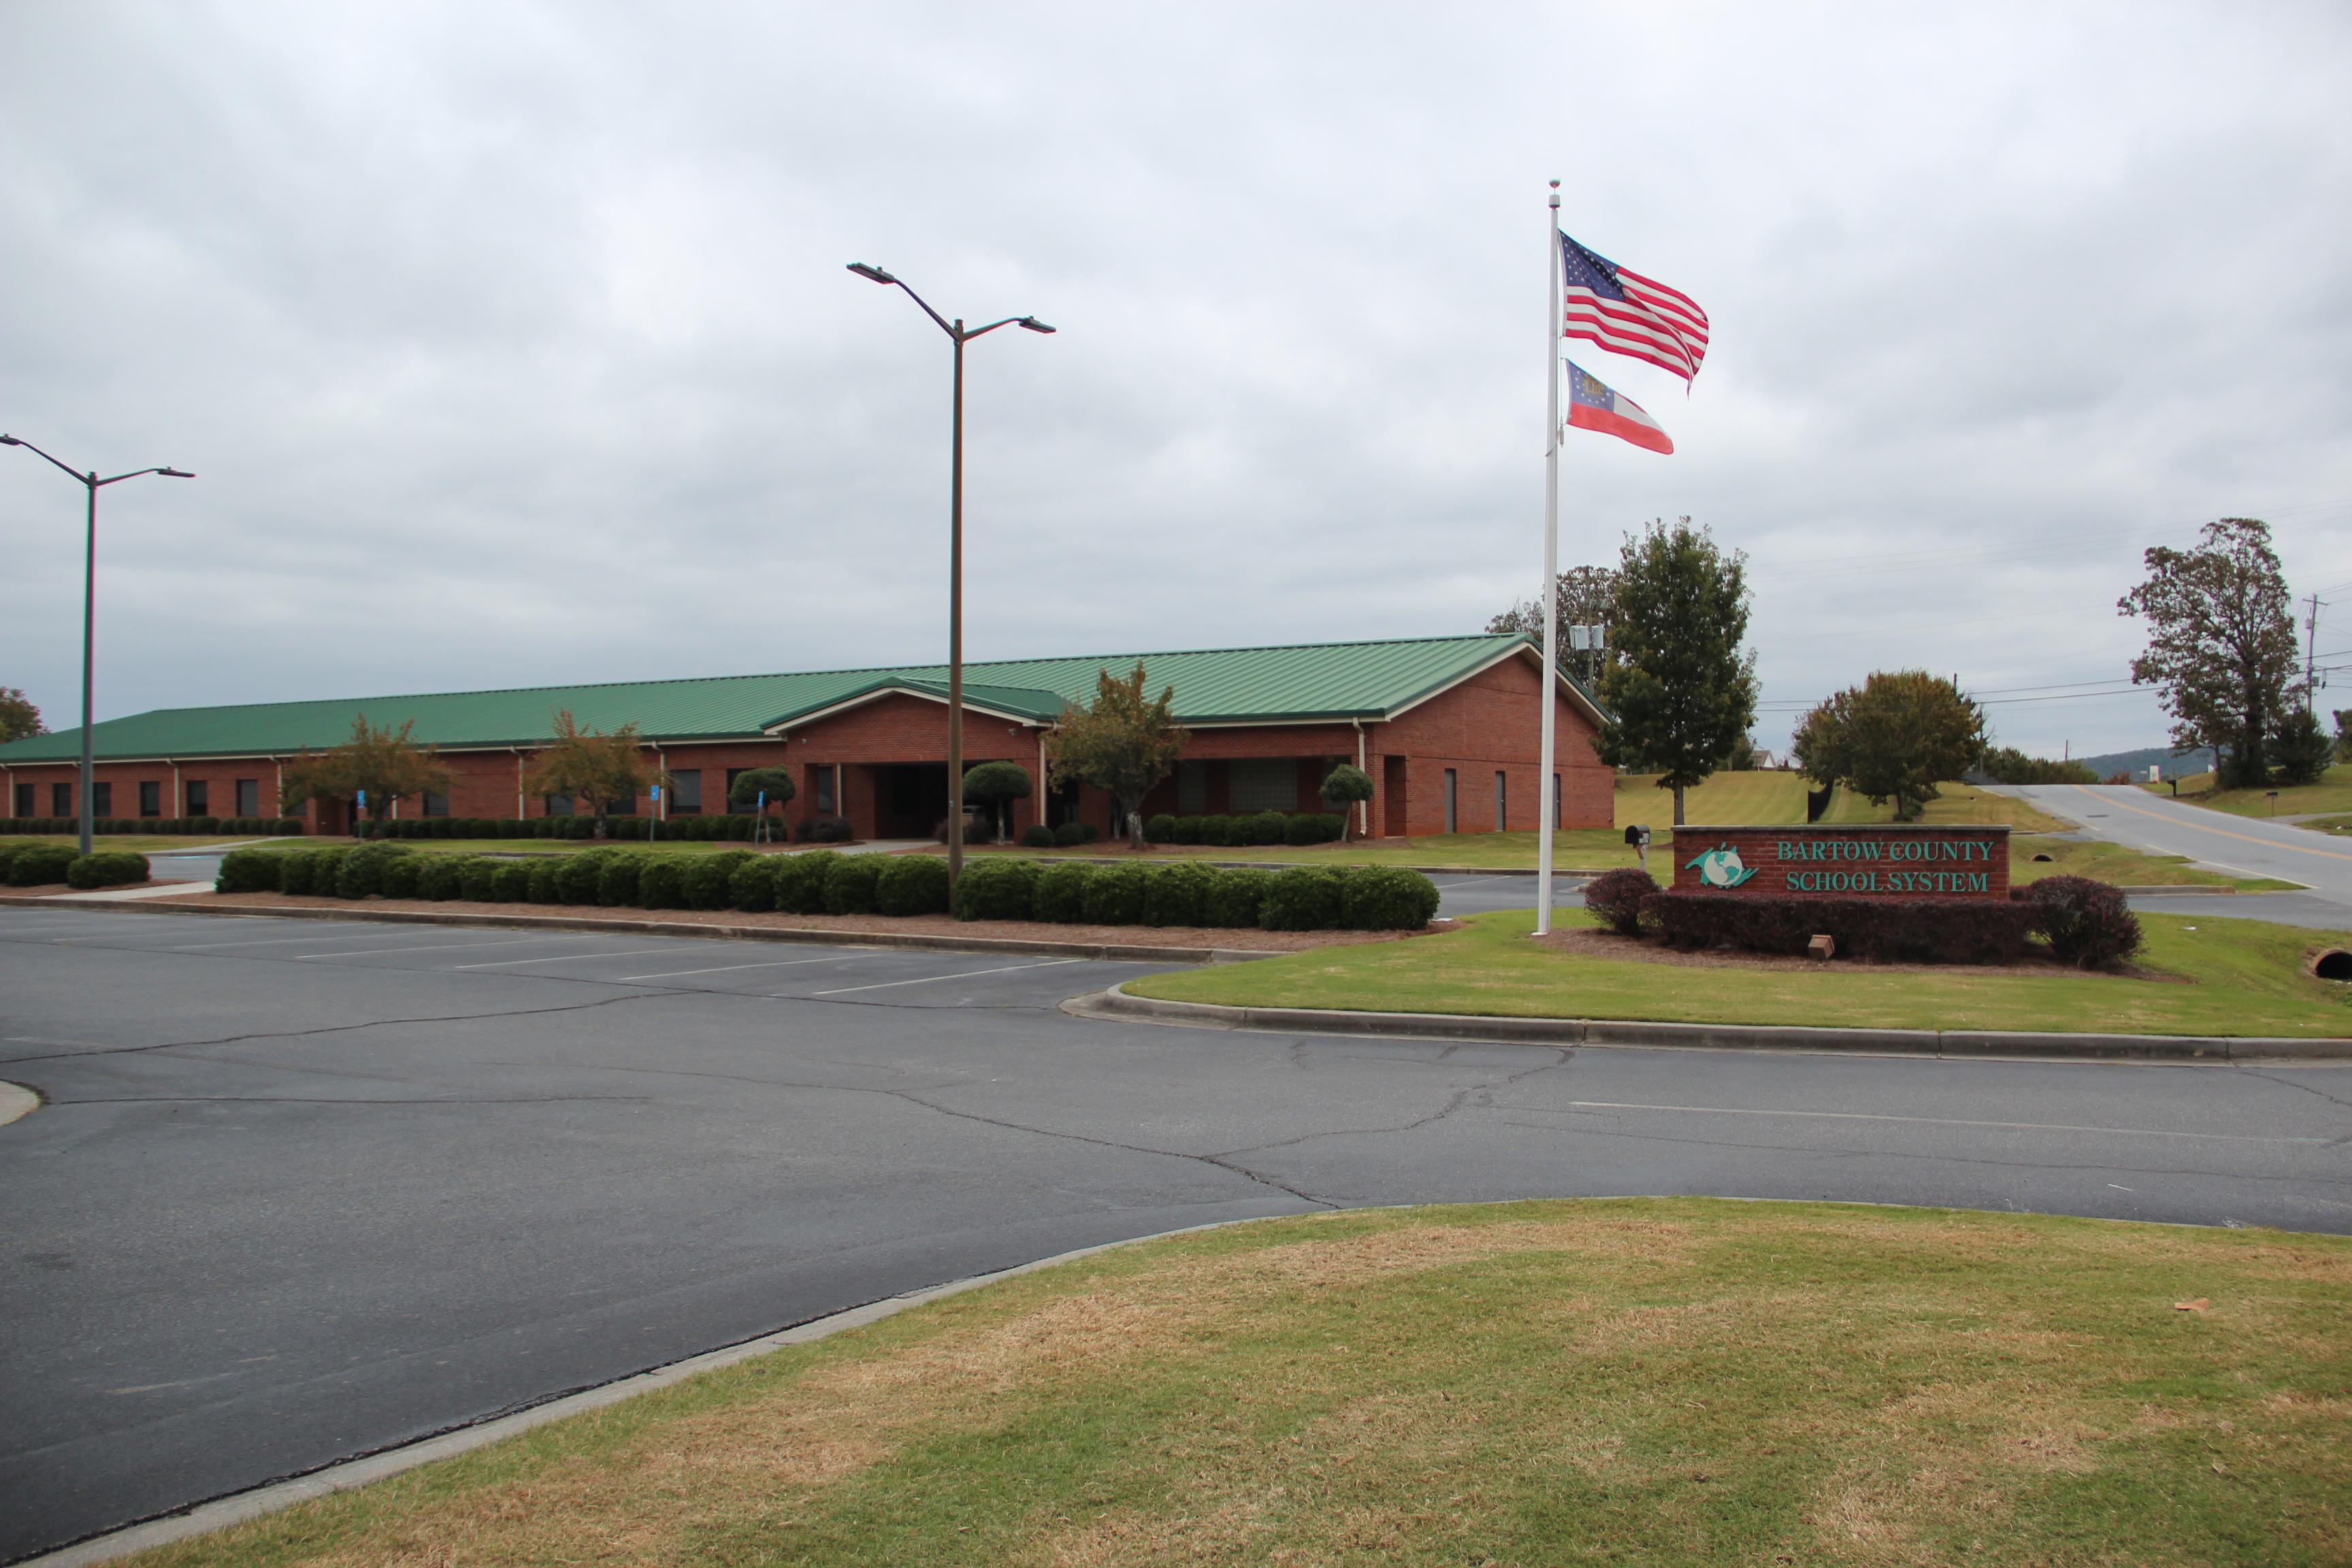 Bartow County School District Wikipedia